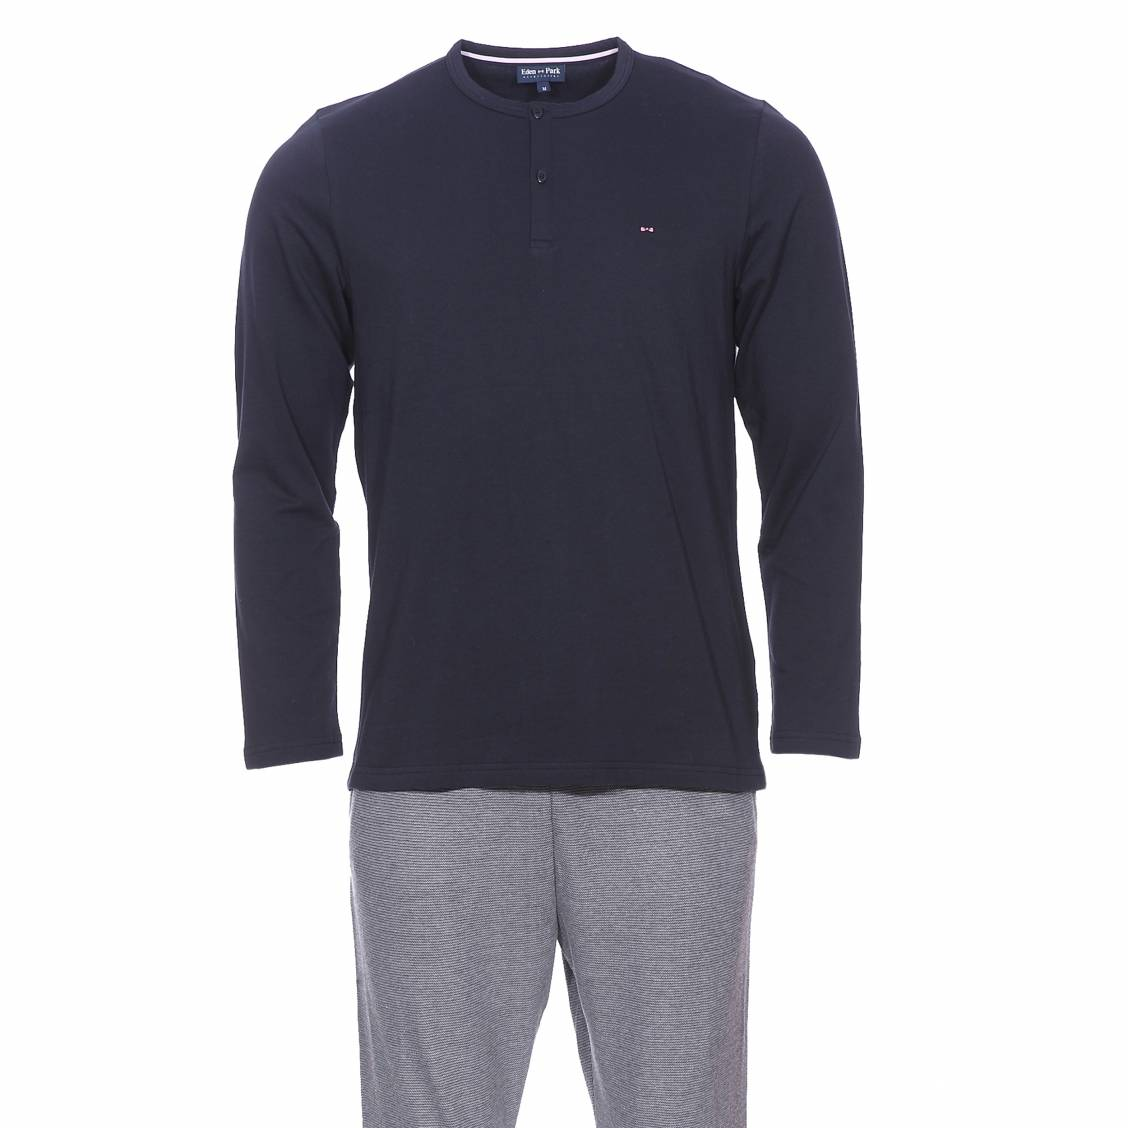 Pyjama long  en coton : tee-shirt col tunisien bleu marine et pantalon en mailles oxford